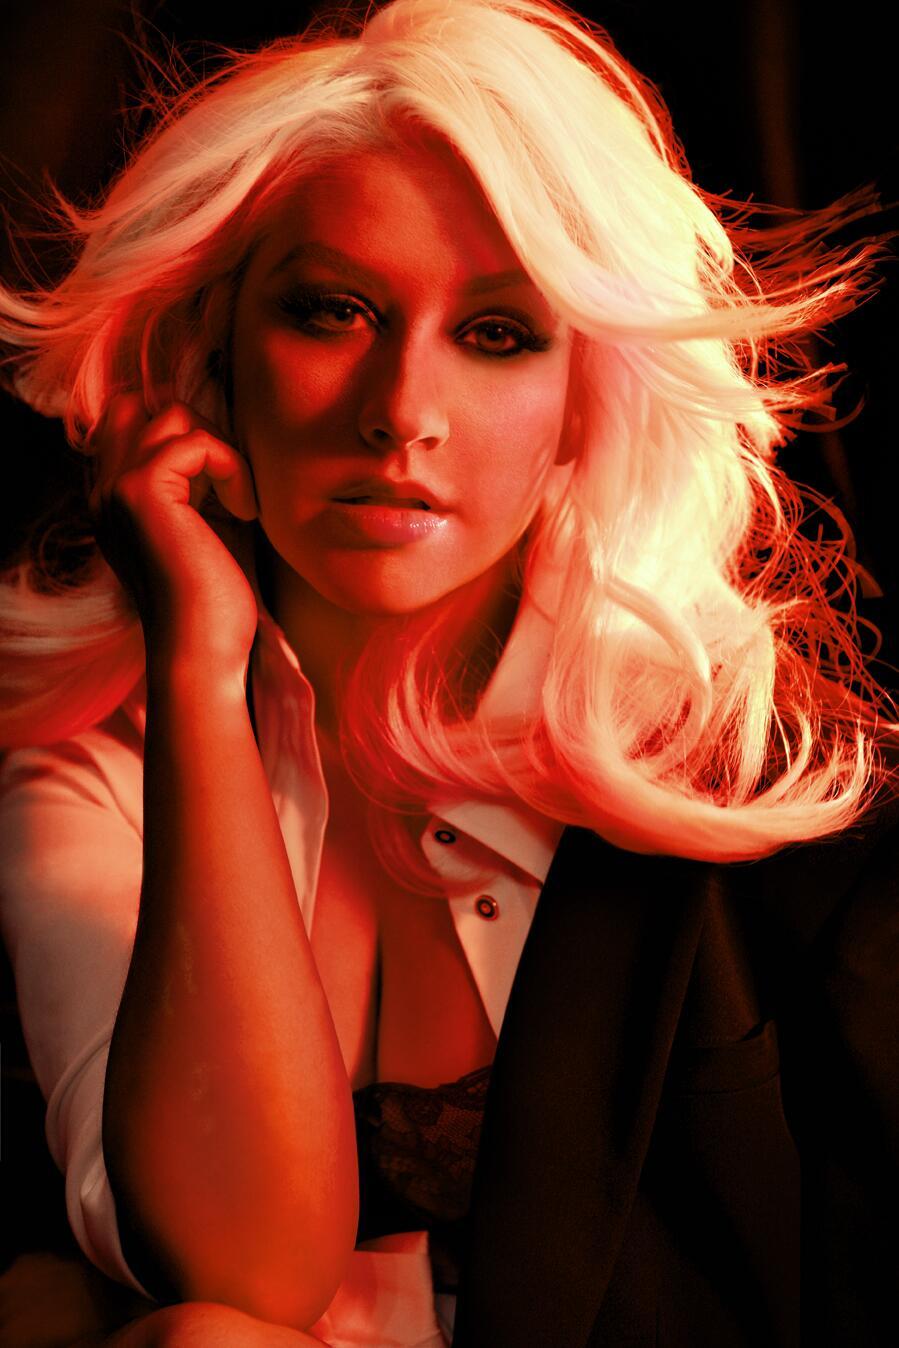 Christina Aguilera proved